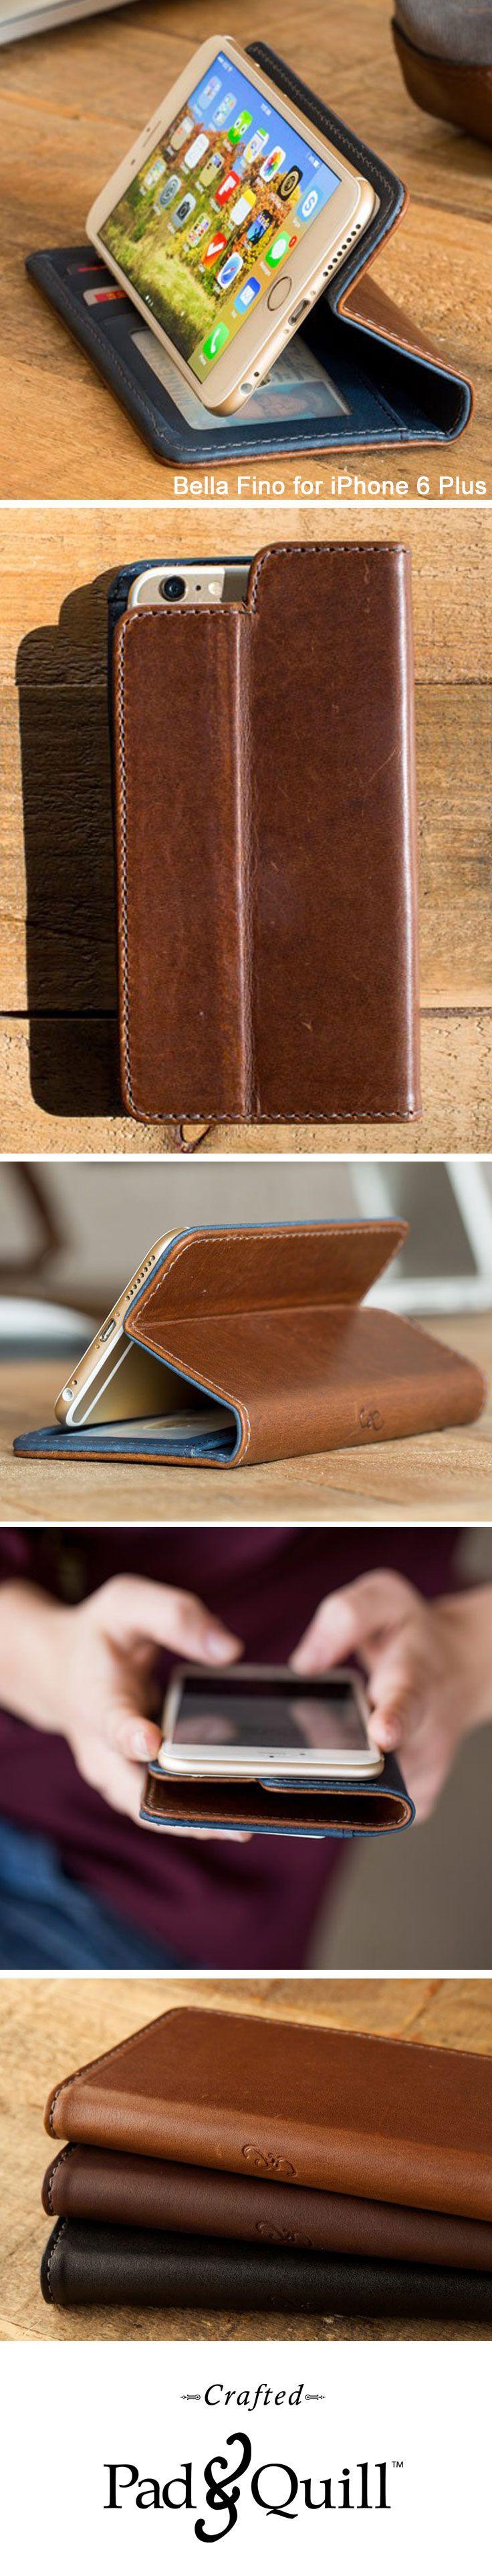 Leather Zip Around Wallet - A Walk in the Woods by VIDA VIDA 5cwpO1VPB2